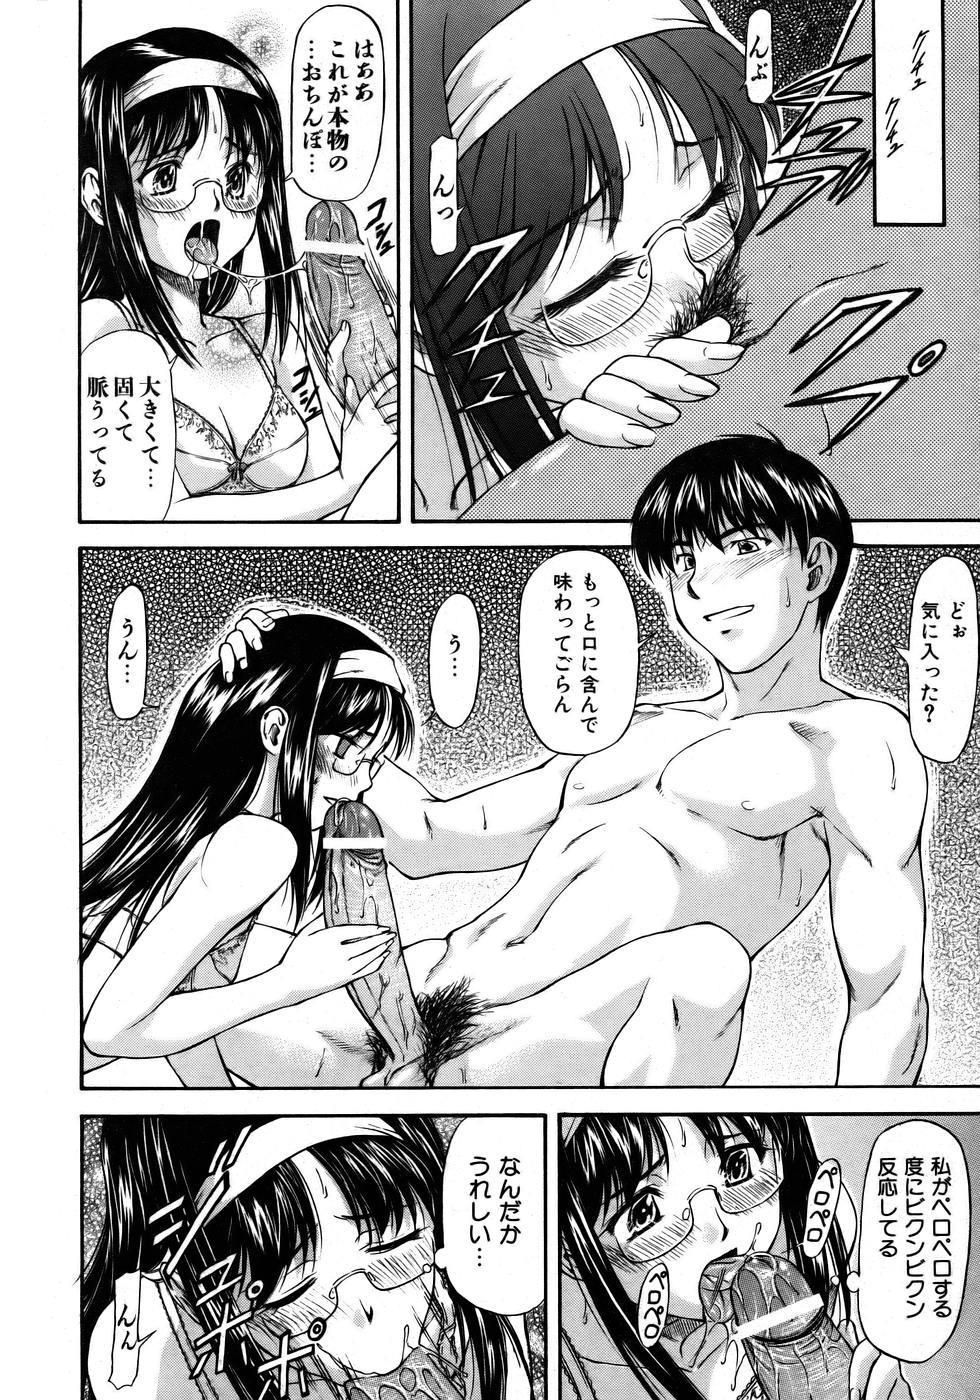 COMIC AUN 2005-12 Vol. 115 45